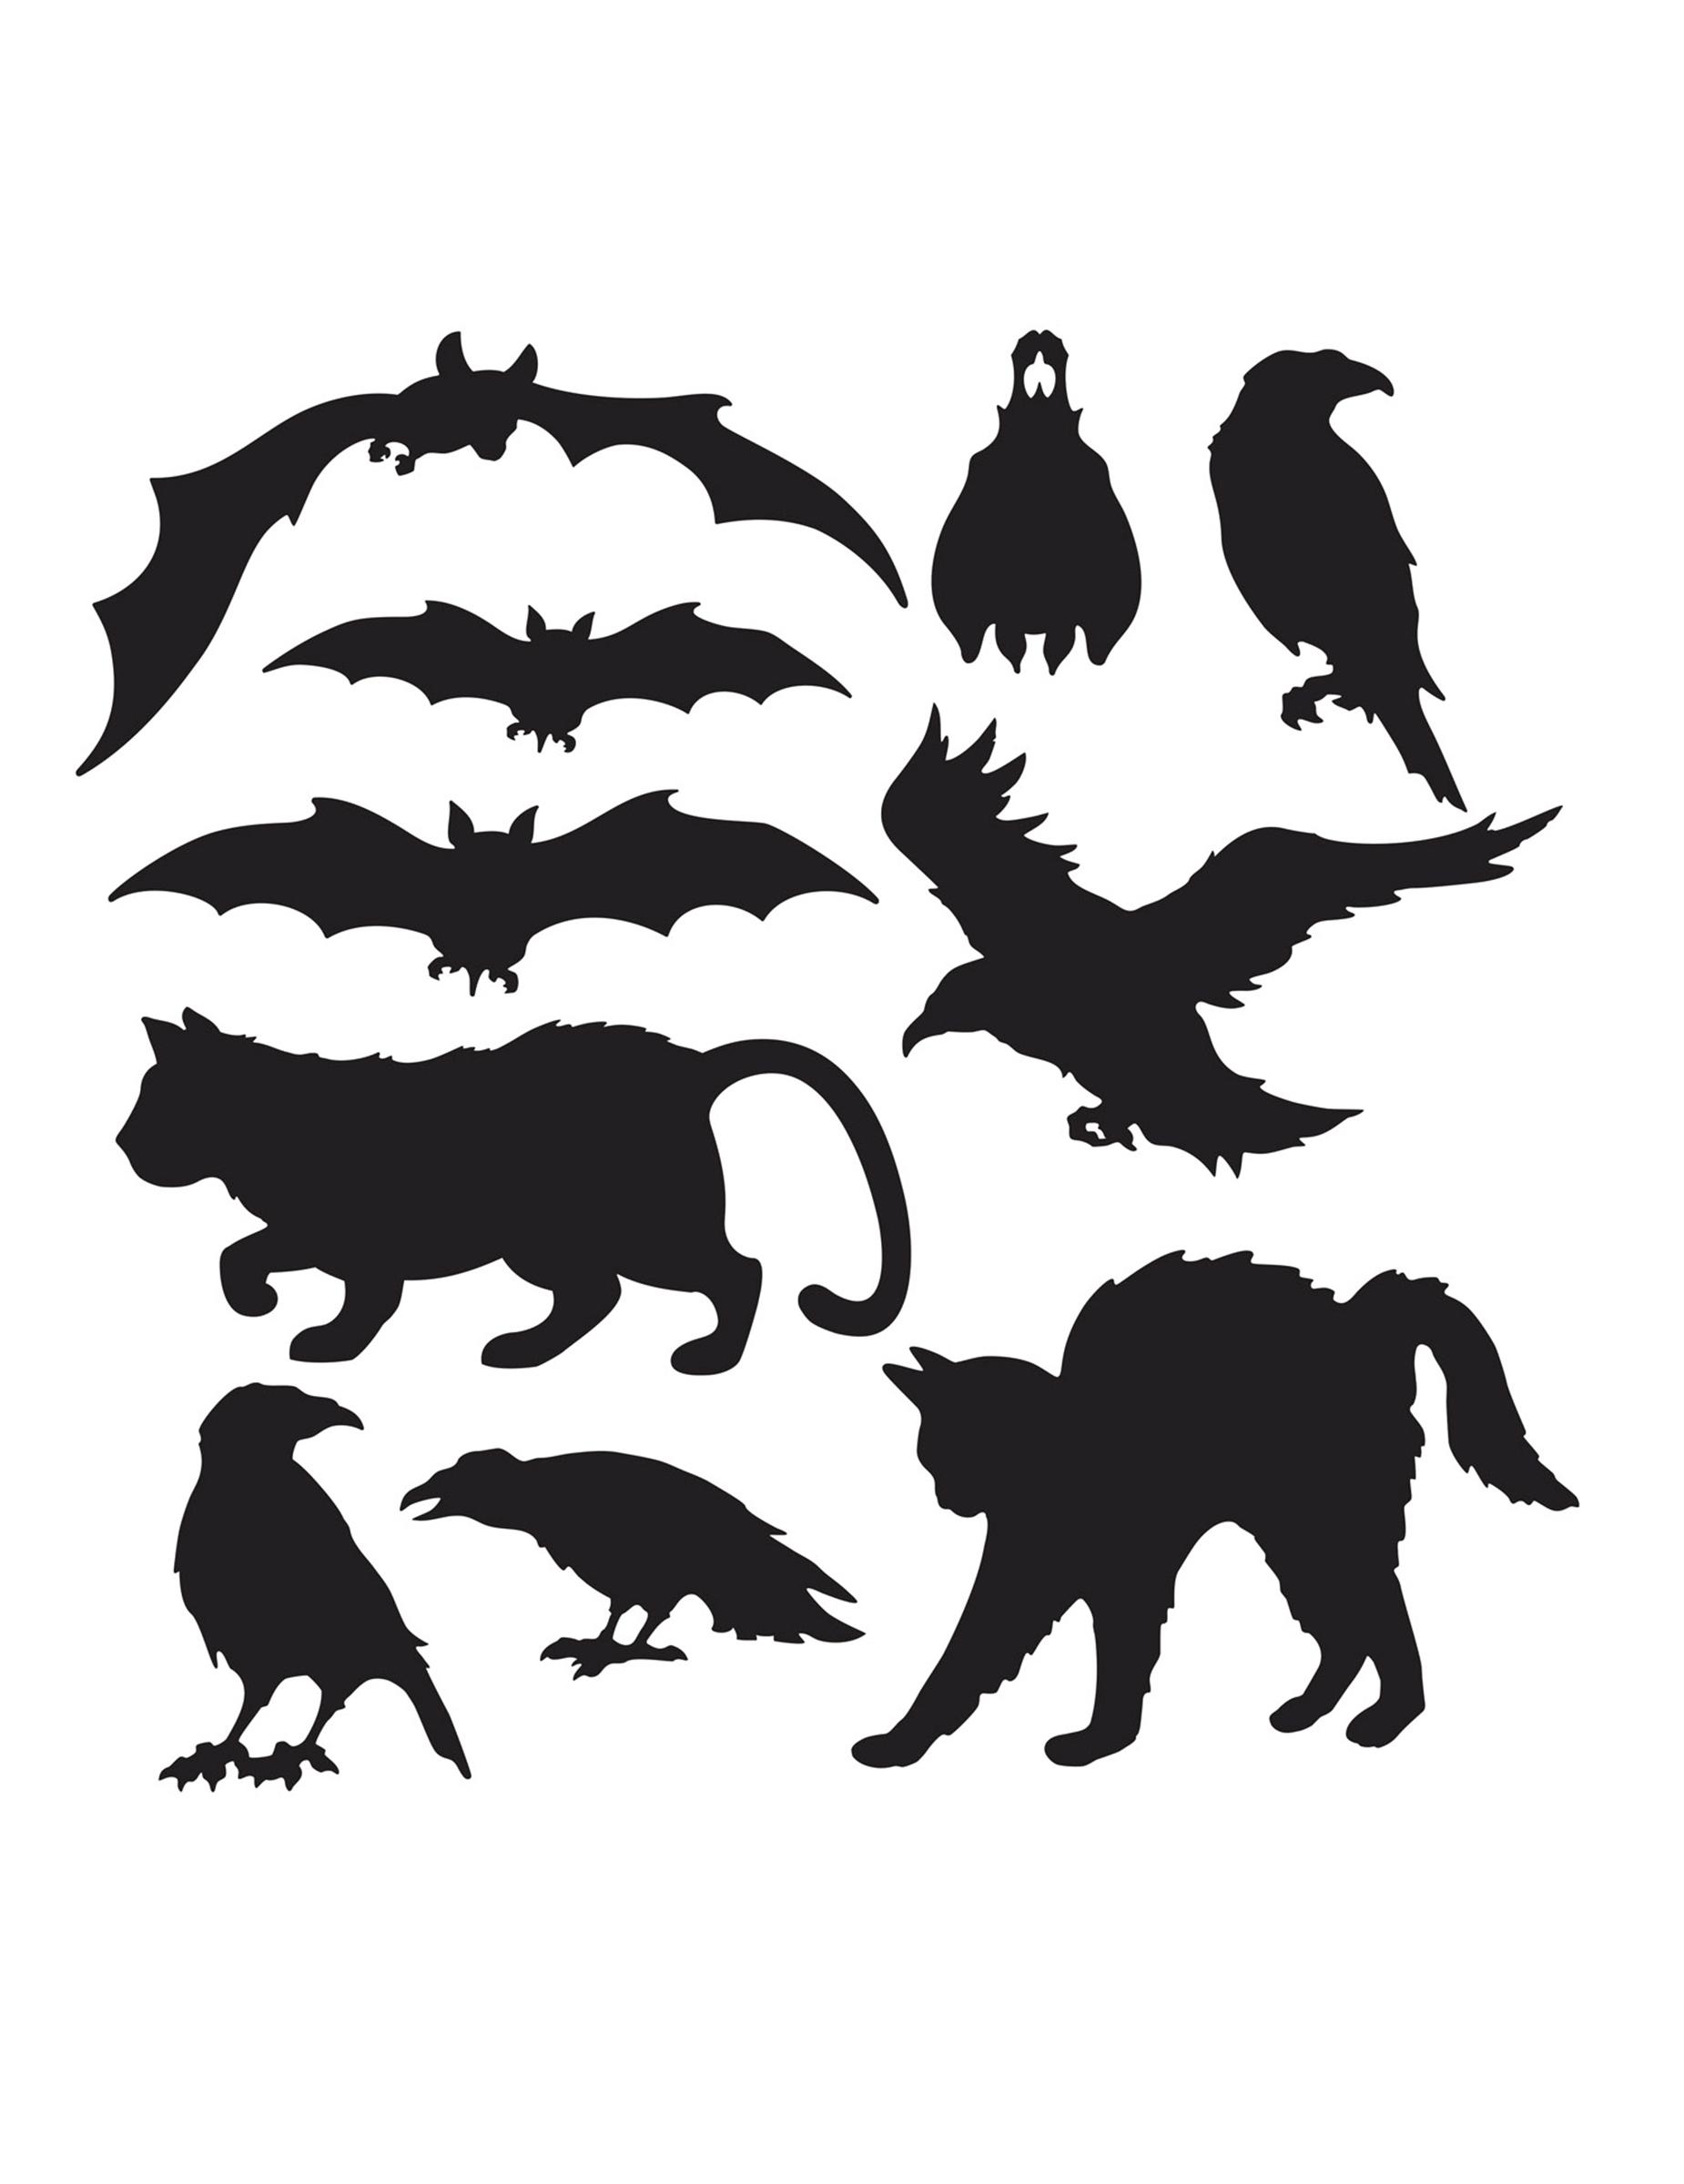 10 decorazioni di carta sagome halloween addobbi e for Decorazioni di carta da appendere